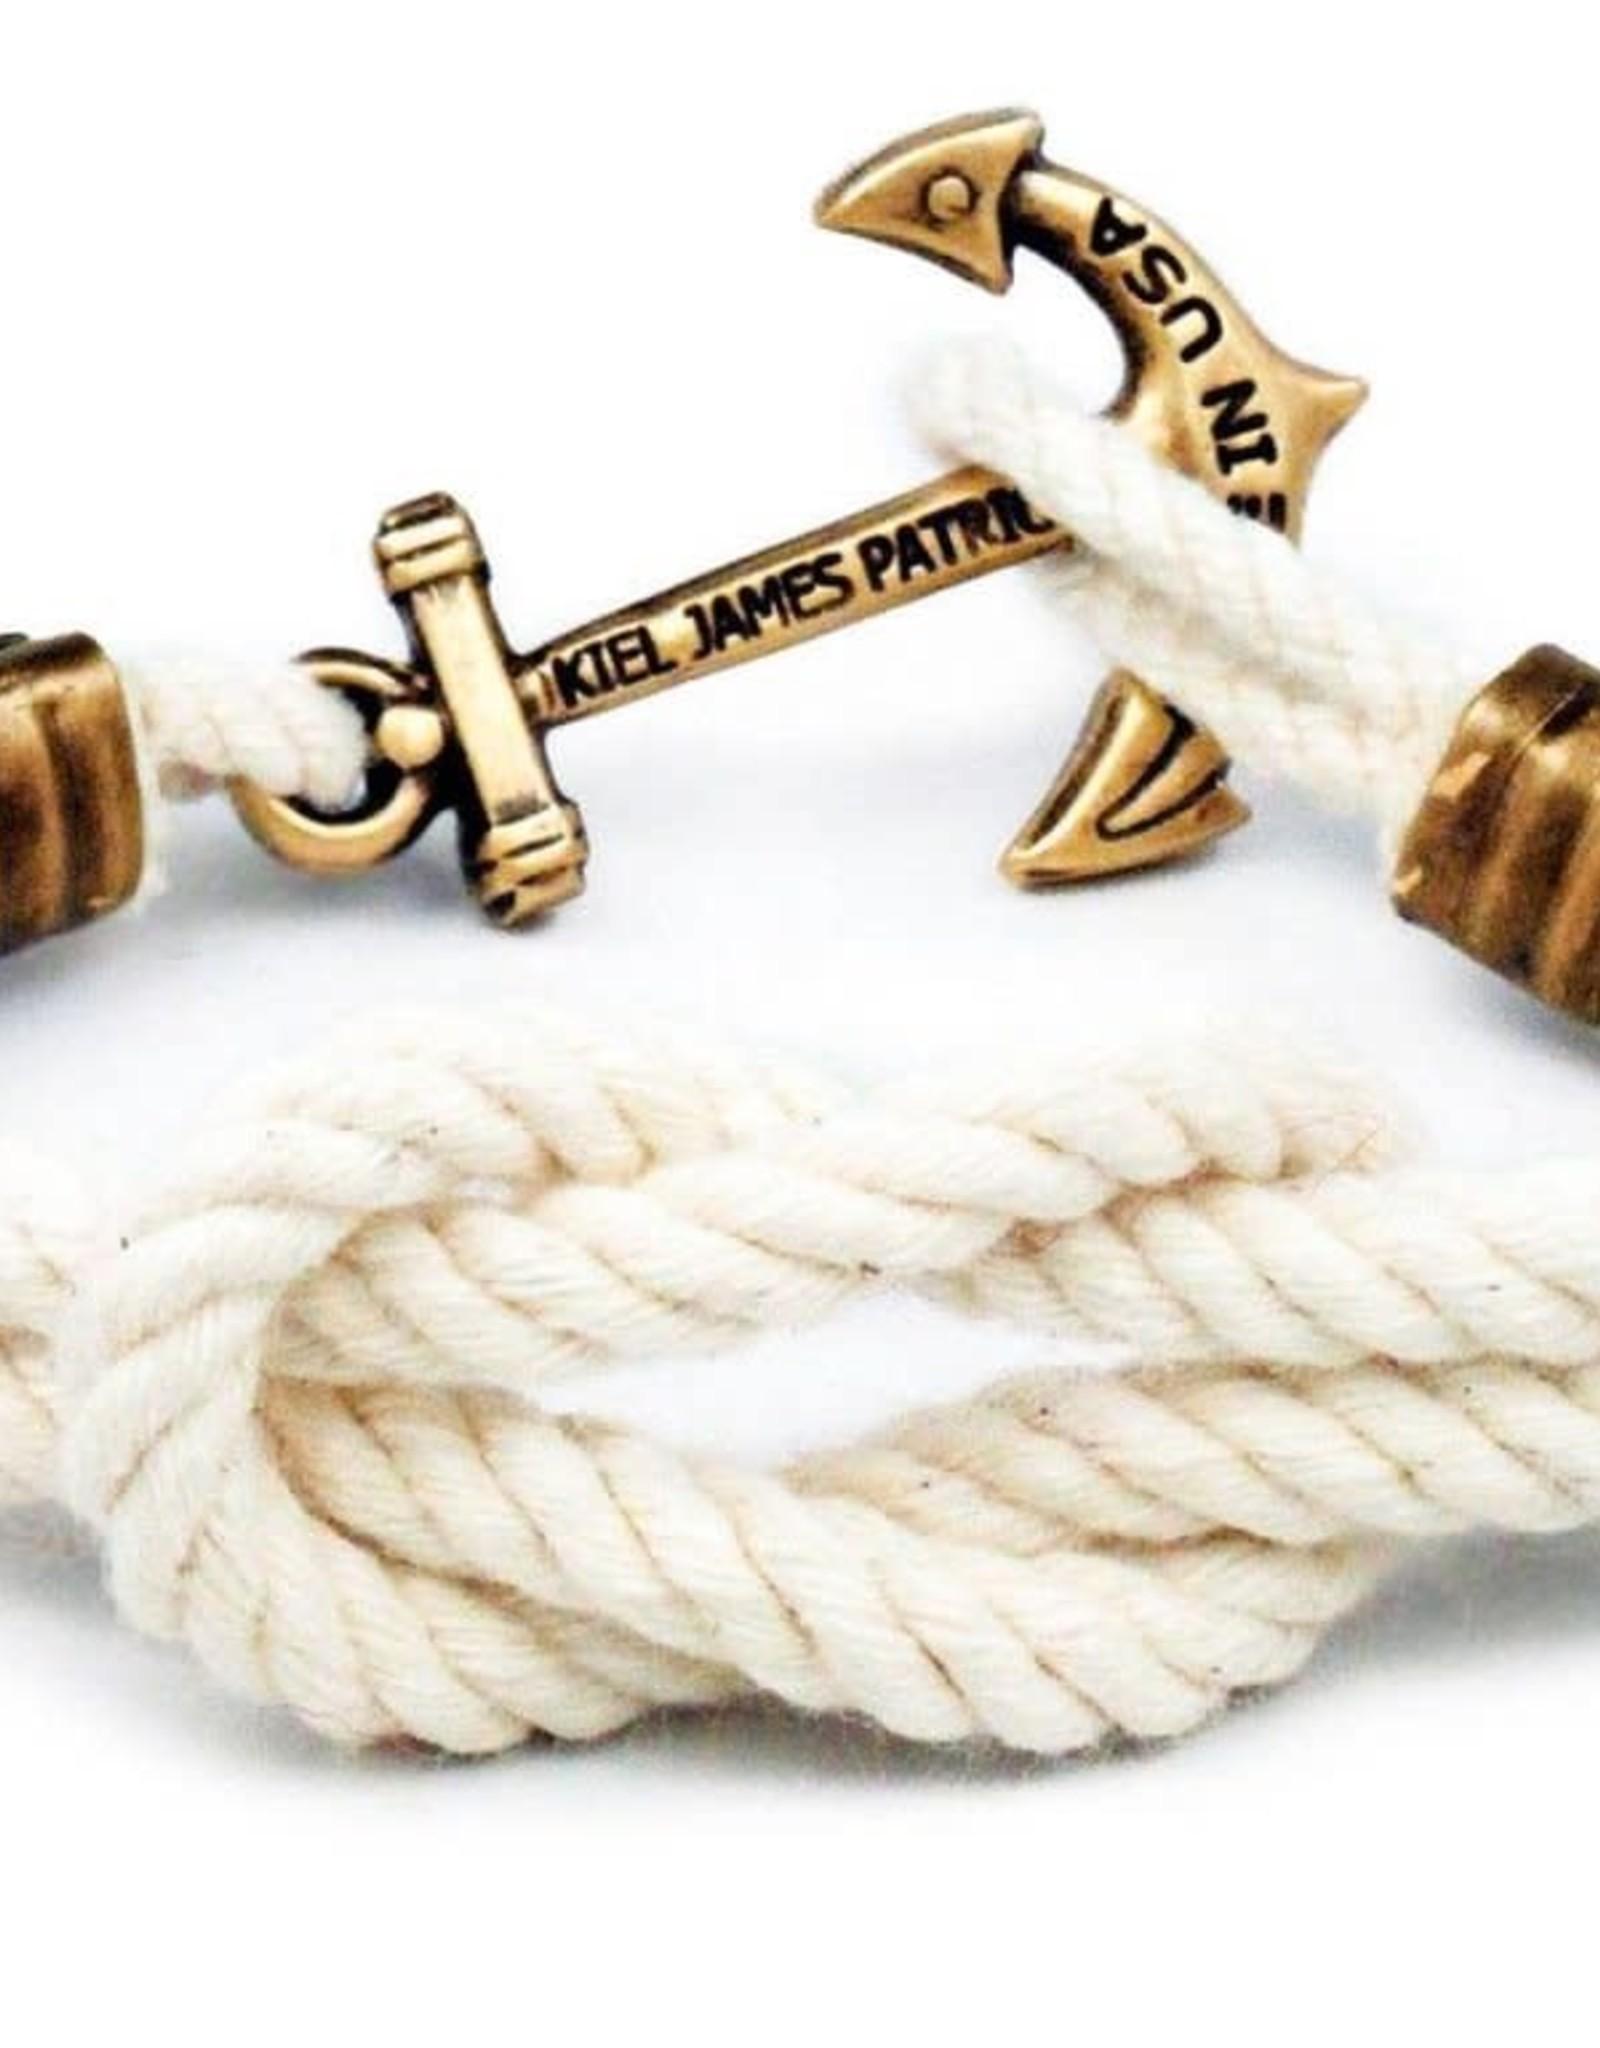 Kiel James Patrick Cape Knot Hitch